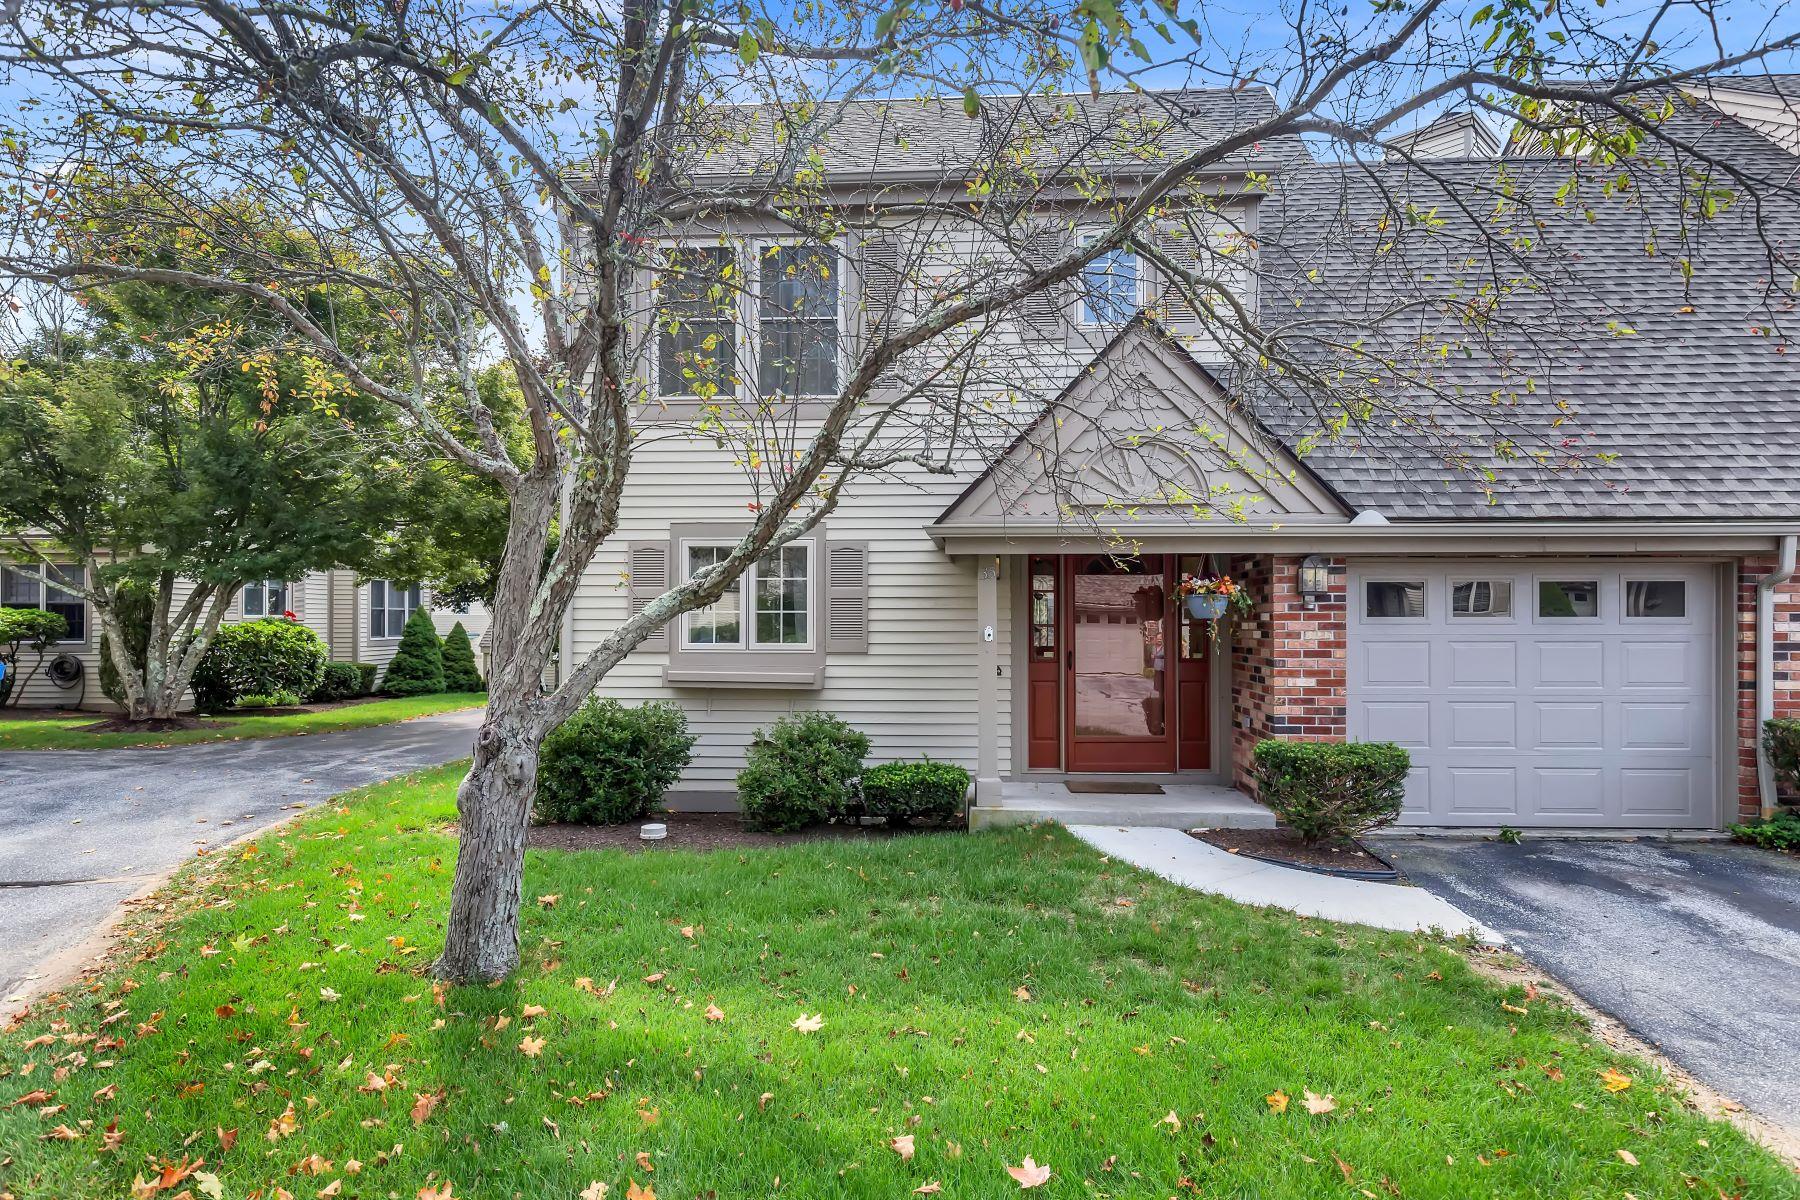 townhouses 为 销售 在 35 Benedict Crossing 35 诺维奇, 康涅狄格州 06360 美国